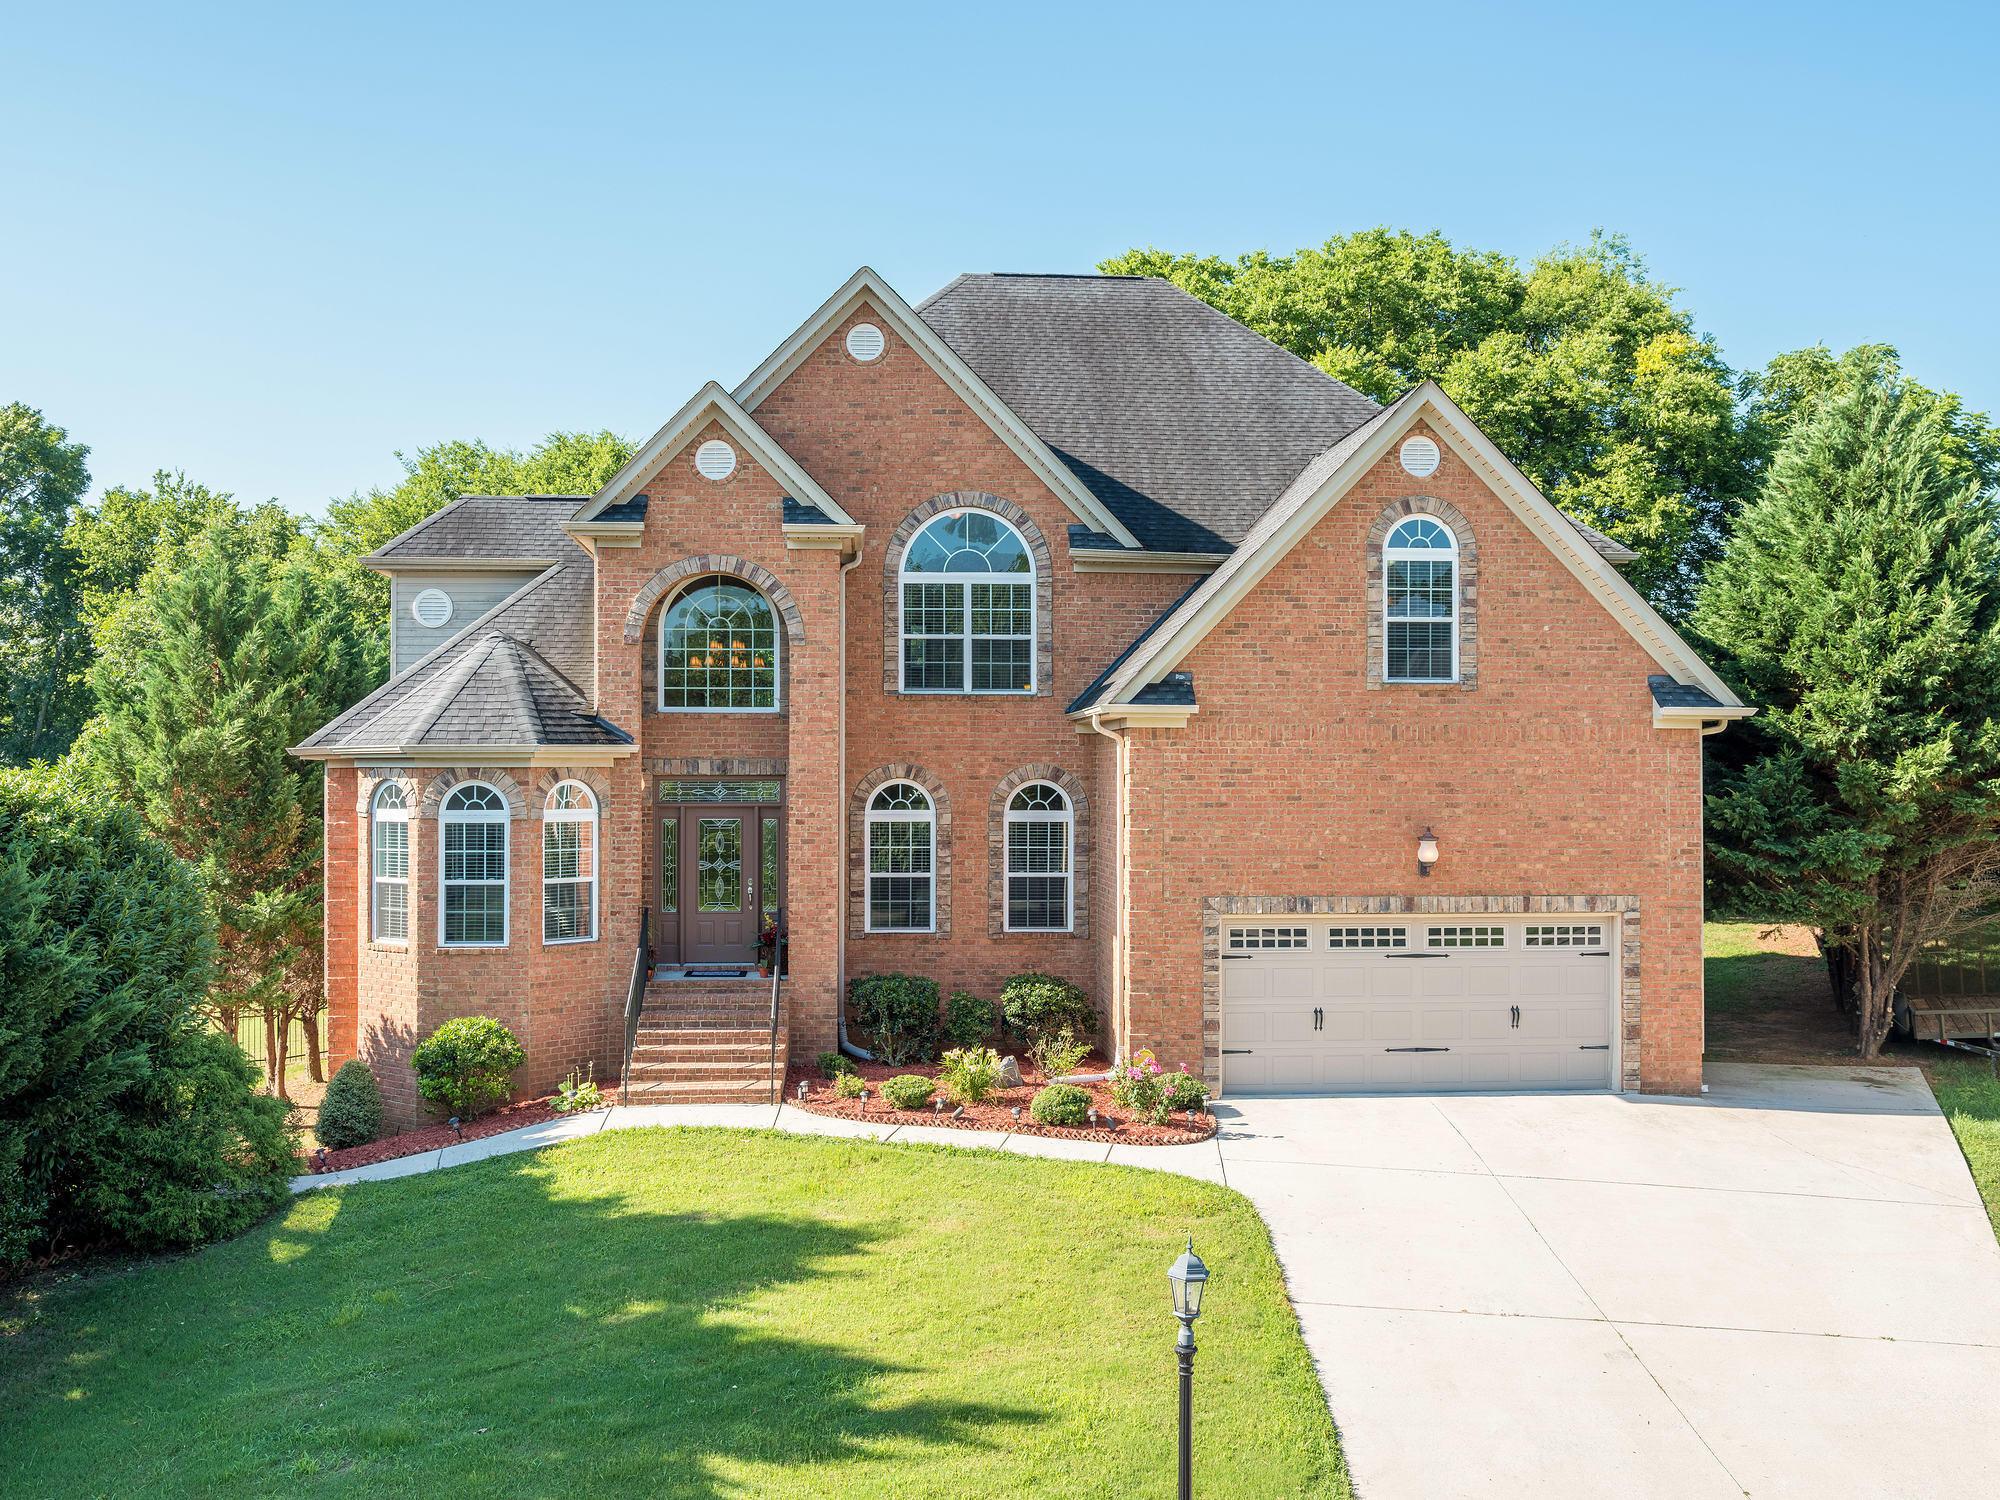 9670 Pecan Springs Cir, Chattanooga, TN 37421